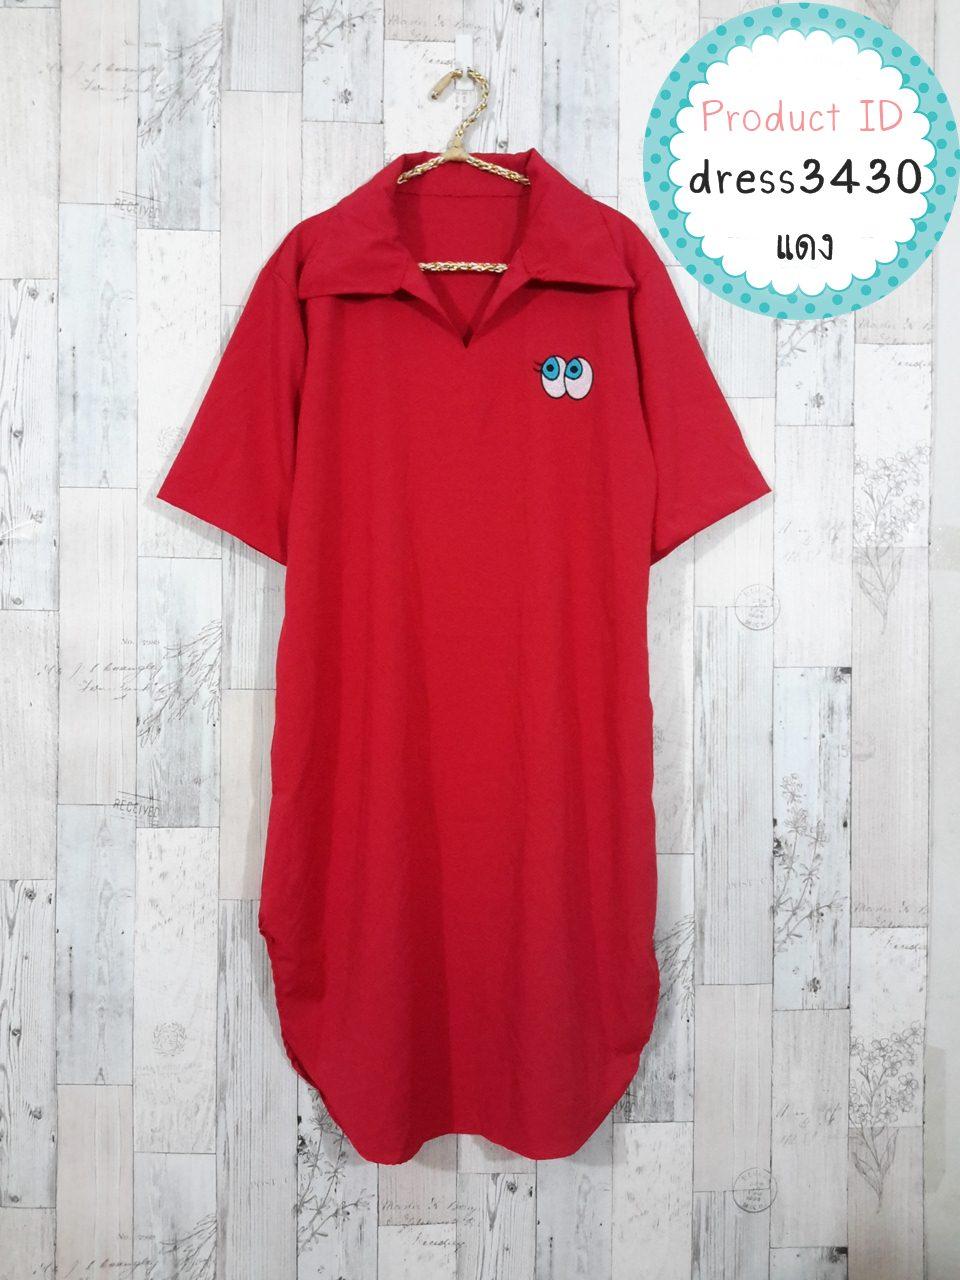 Dress3430 Big Size Dress ชุดเดรสไซส์ใหญ่คอปกเชิ้ต แขนสั้น ผ้าหางกระรอกเนื้อดีสีพื้นแดง